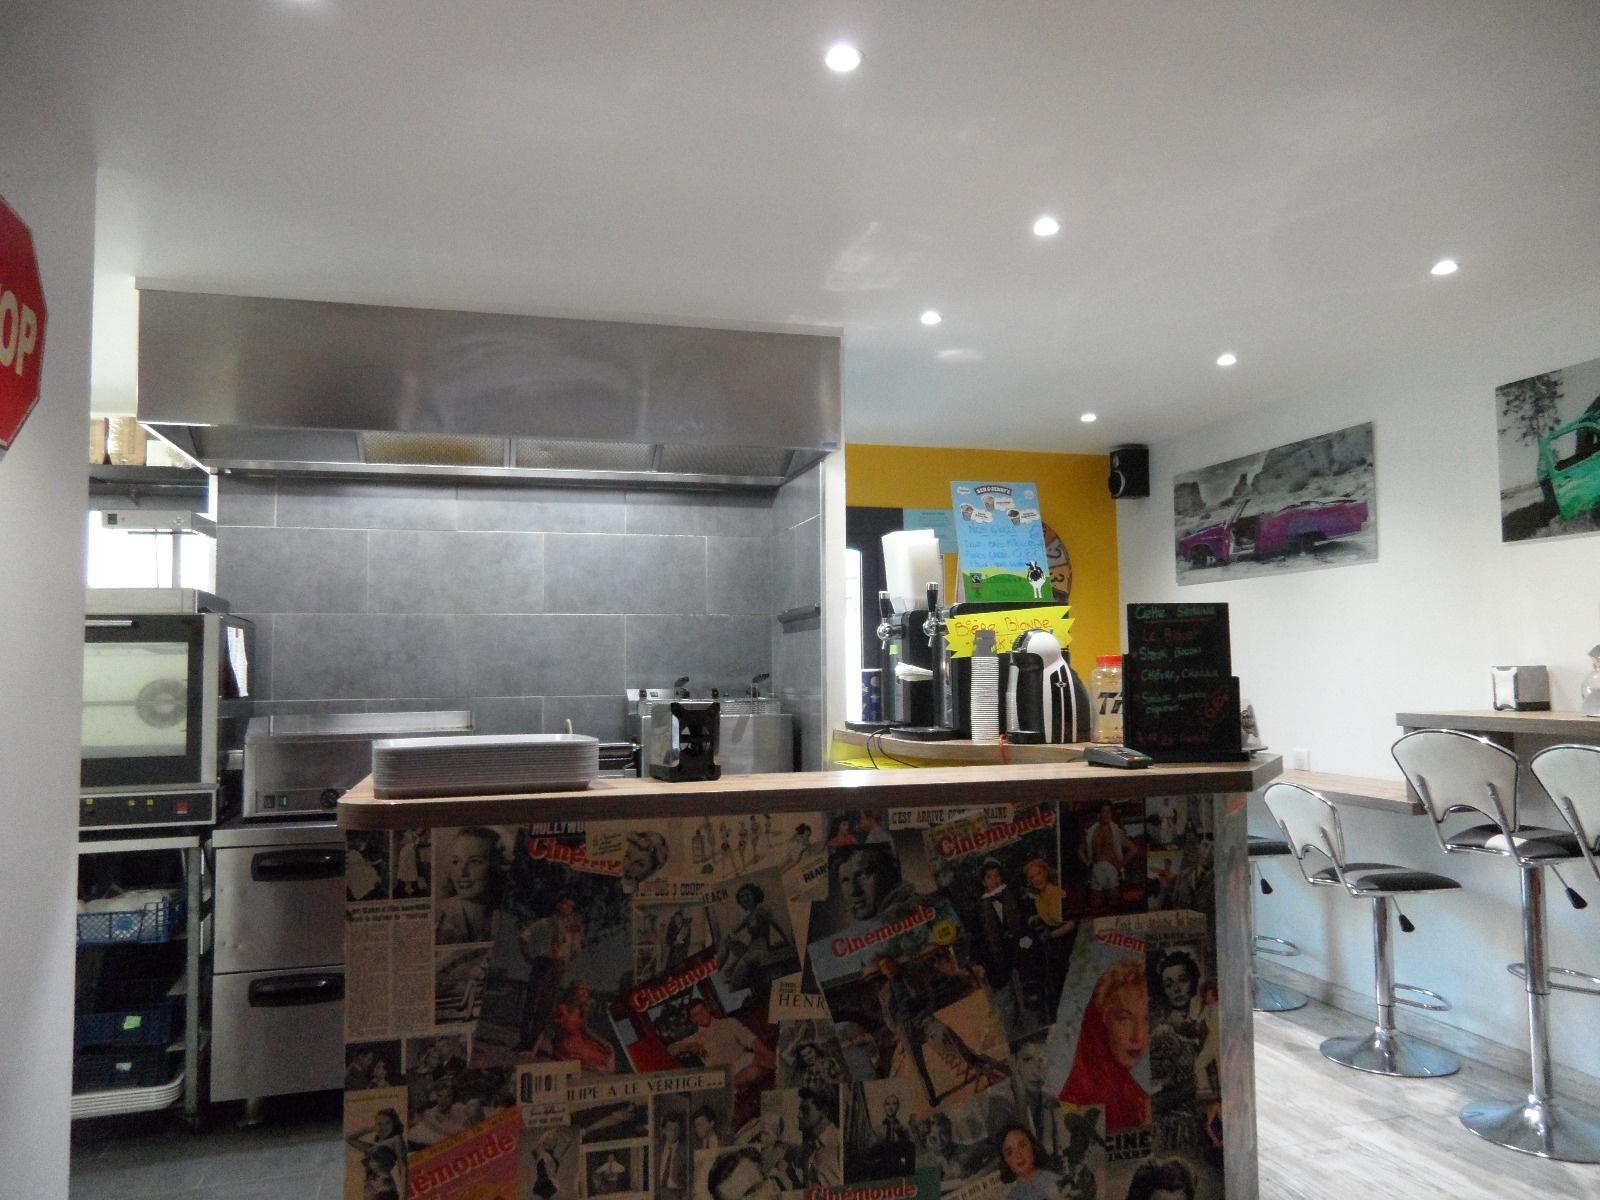 vente immobilier professionnel 85 restauration rapide avec terrasse centre. Black Bedroom Furniture Sets. Home Design Ideas